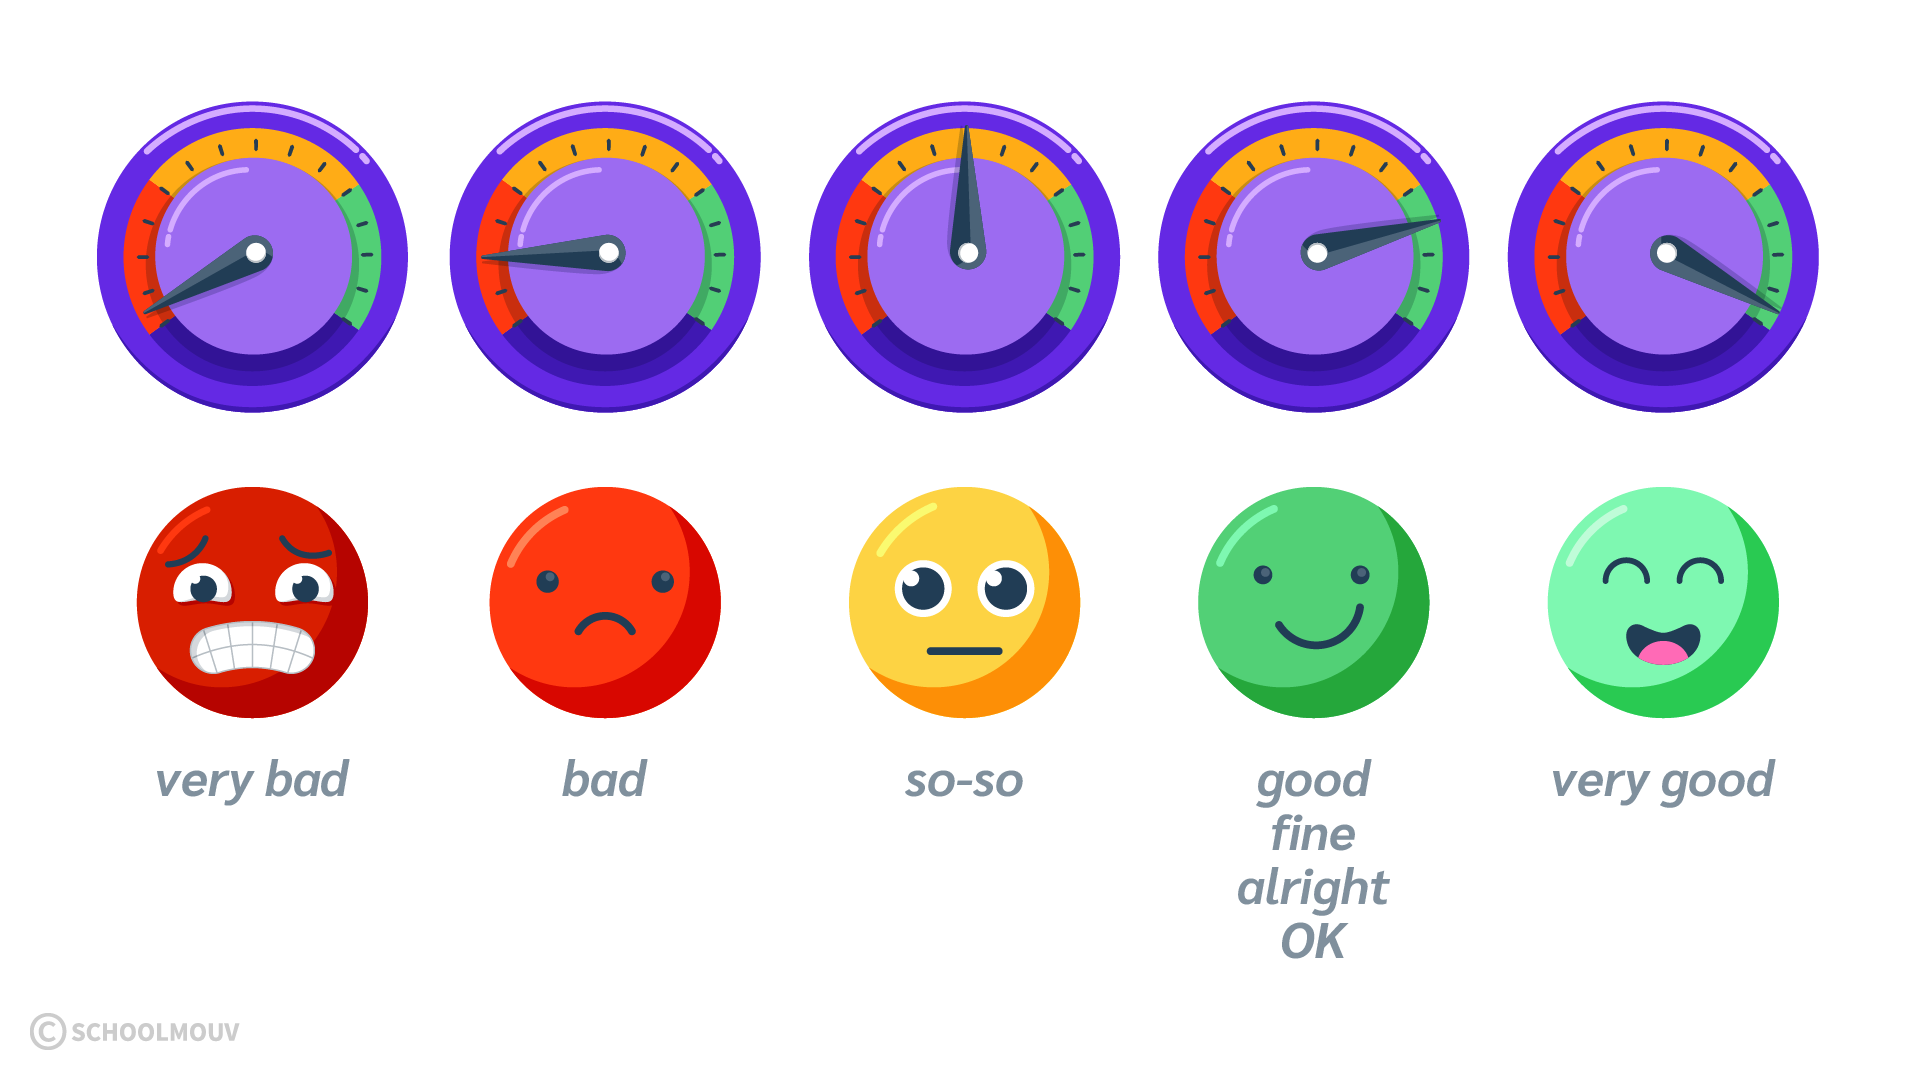 humeur émotion sentiment how are you anglais